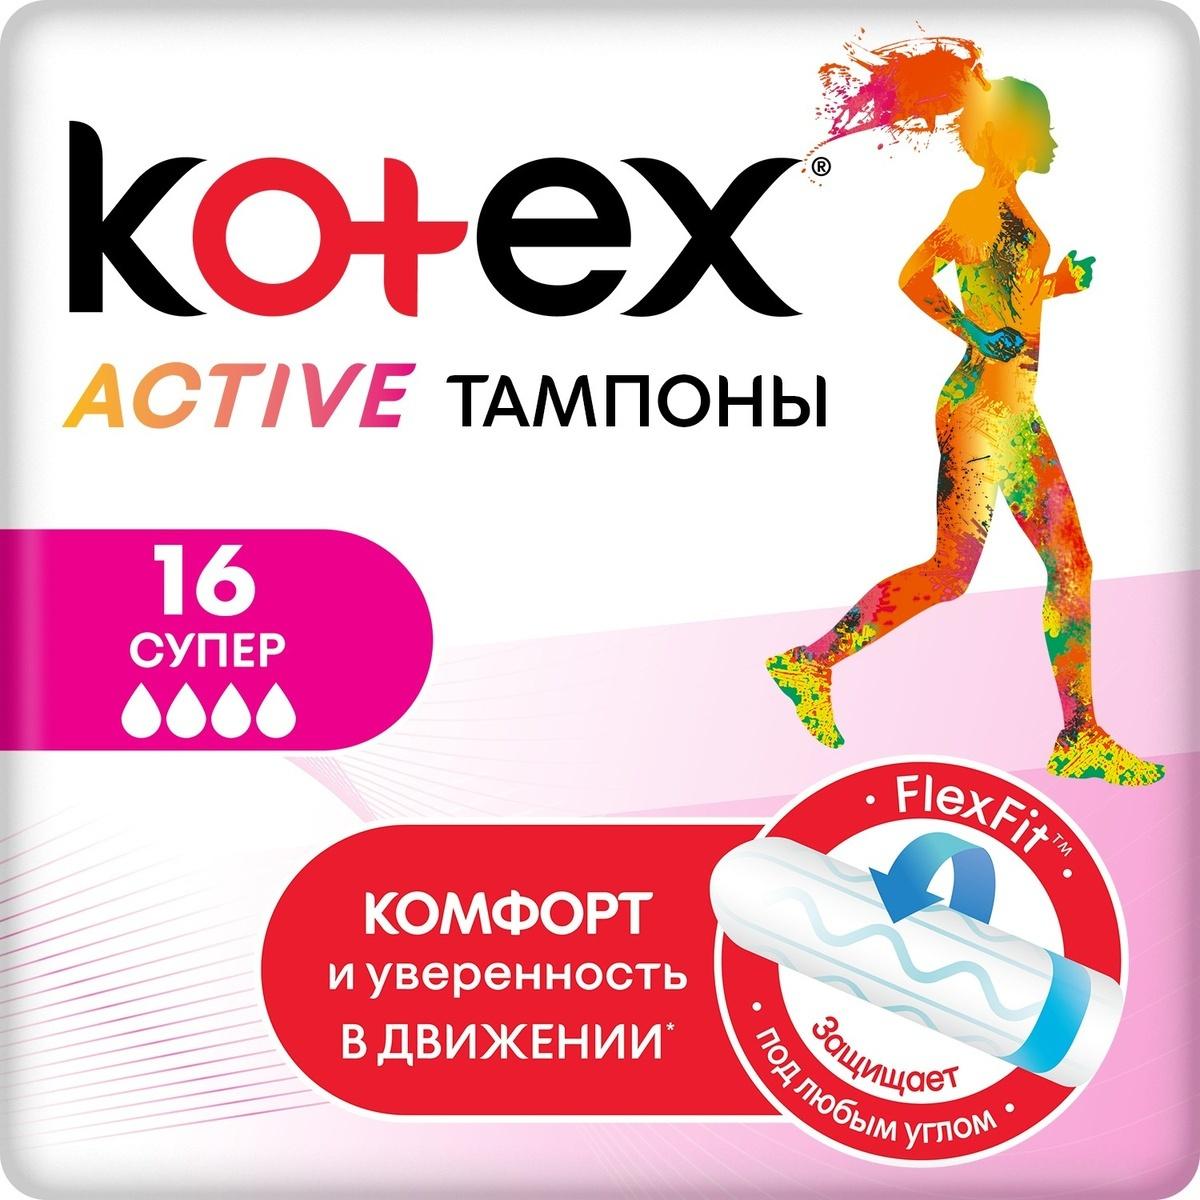 Kotex Тампоны Active Super, 16 шт #1